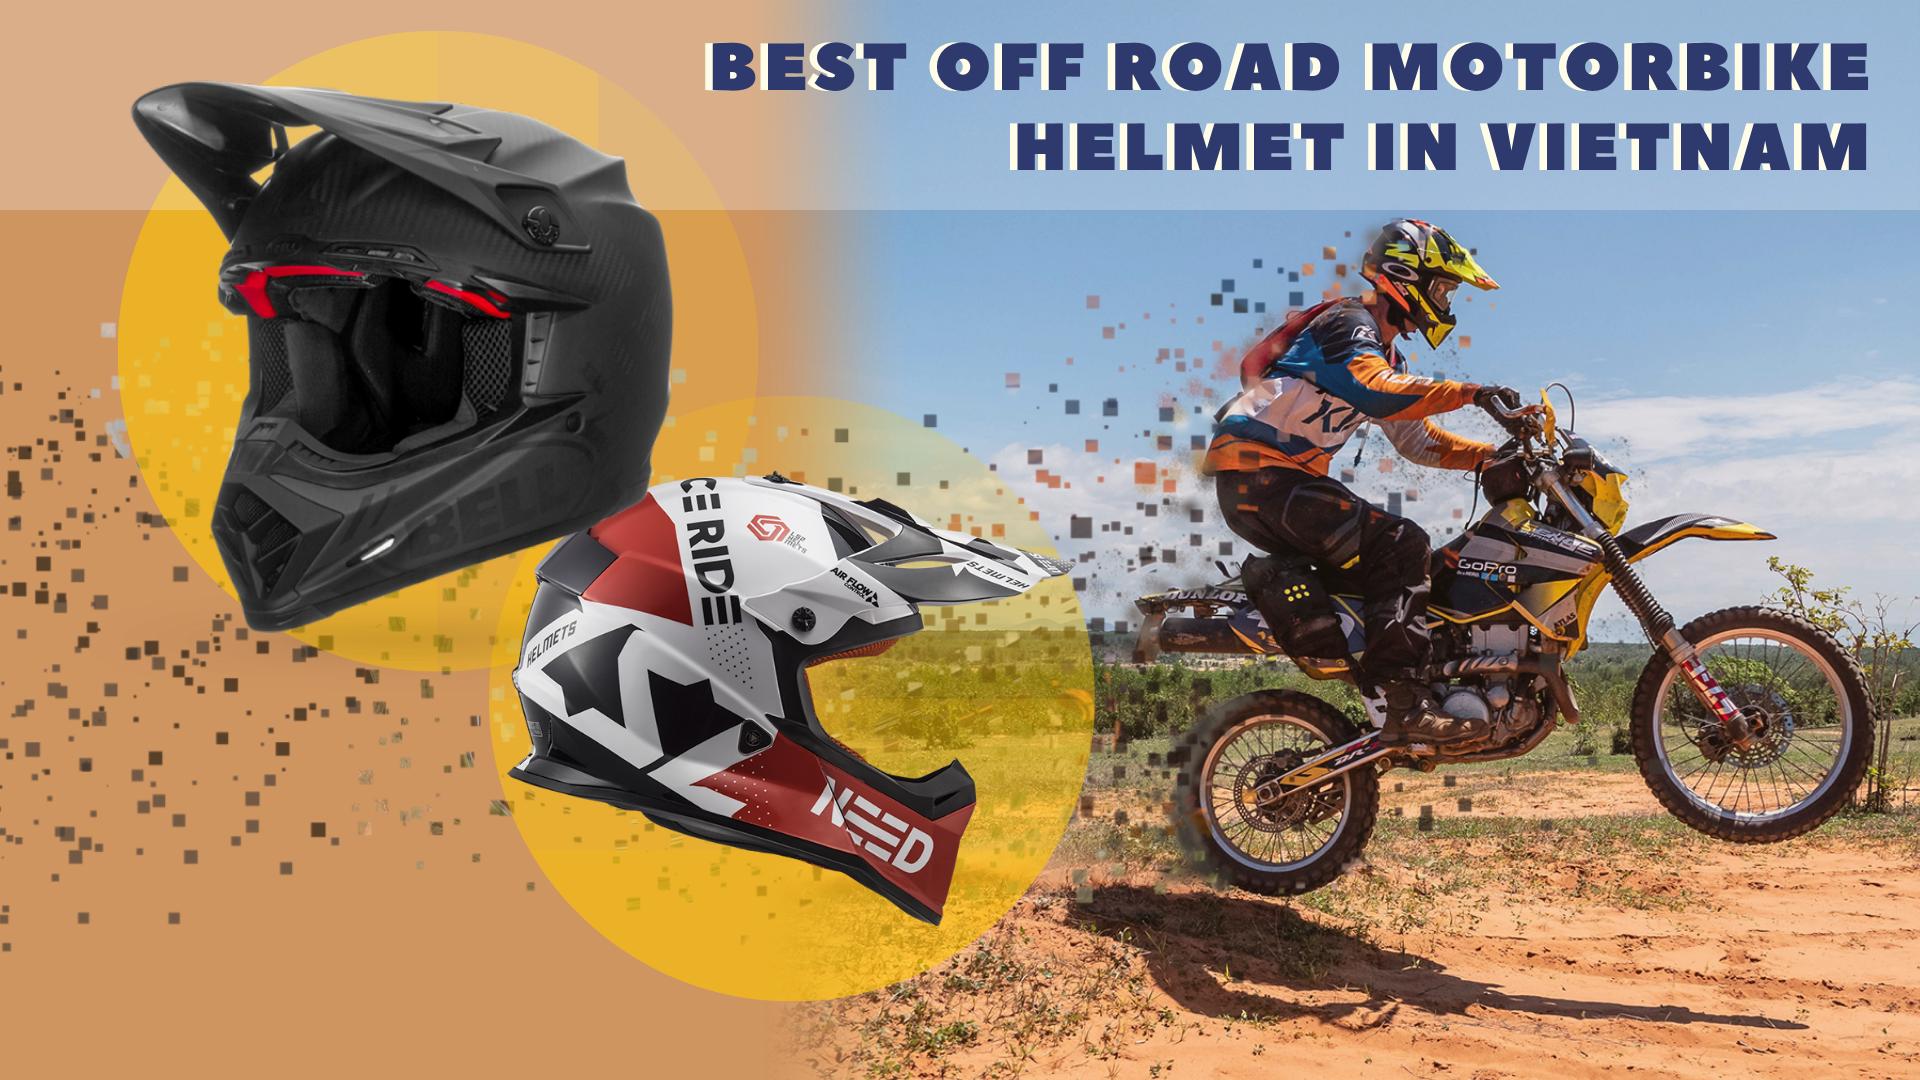 Best Off Road Motorbike Helmets In Vietnam 2019